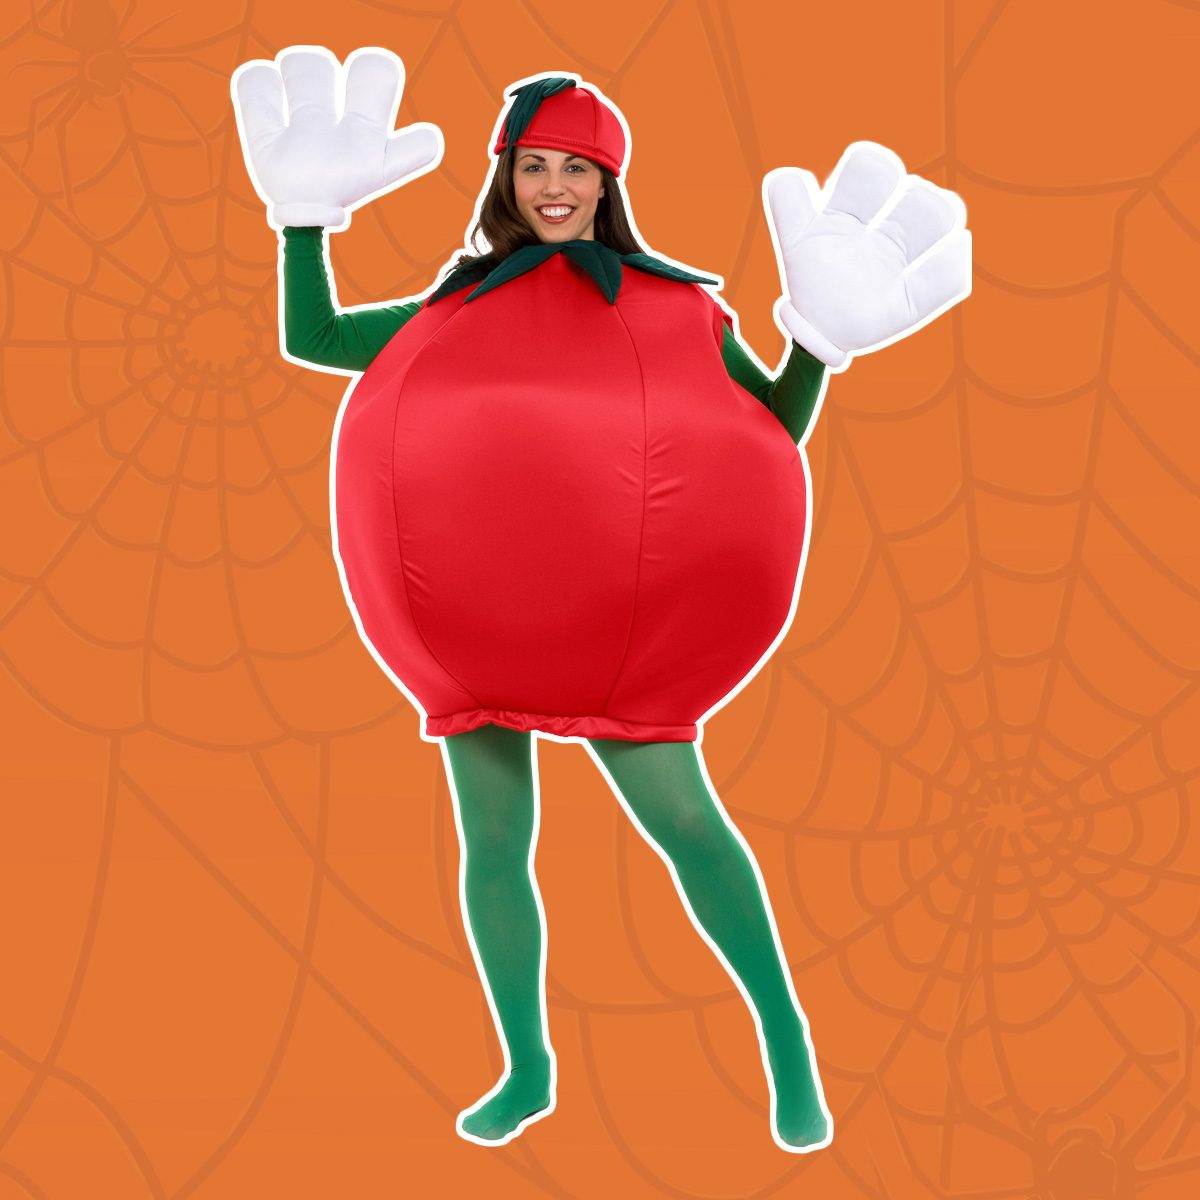 Tomato lady